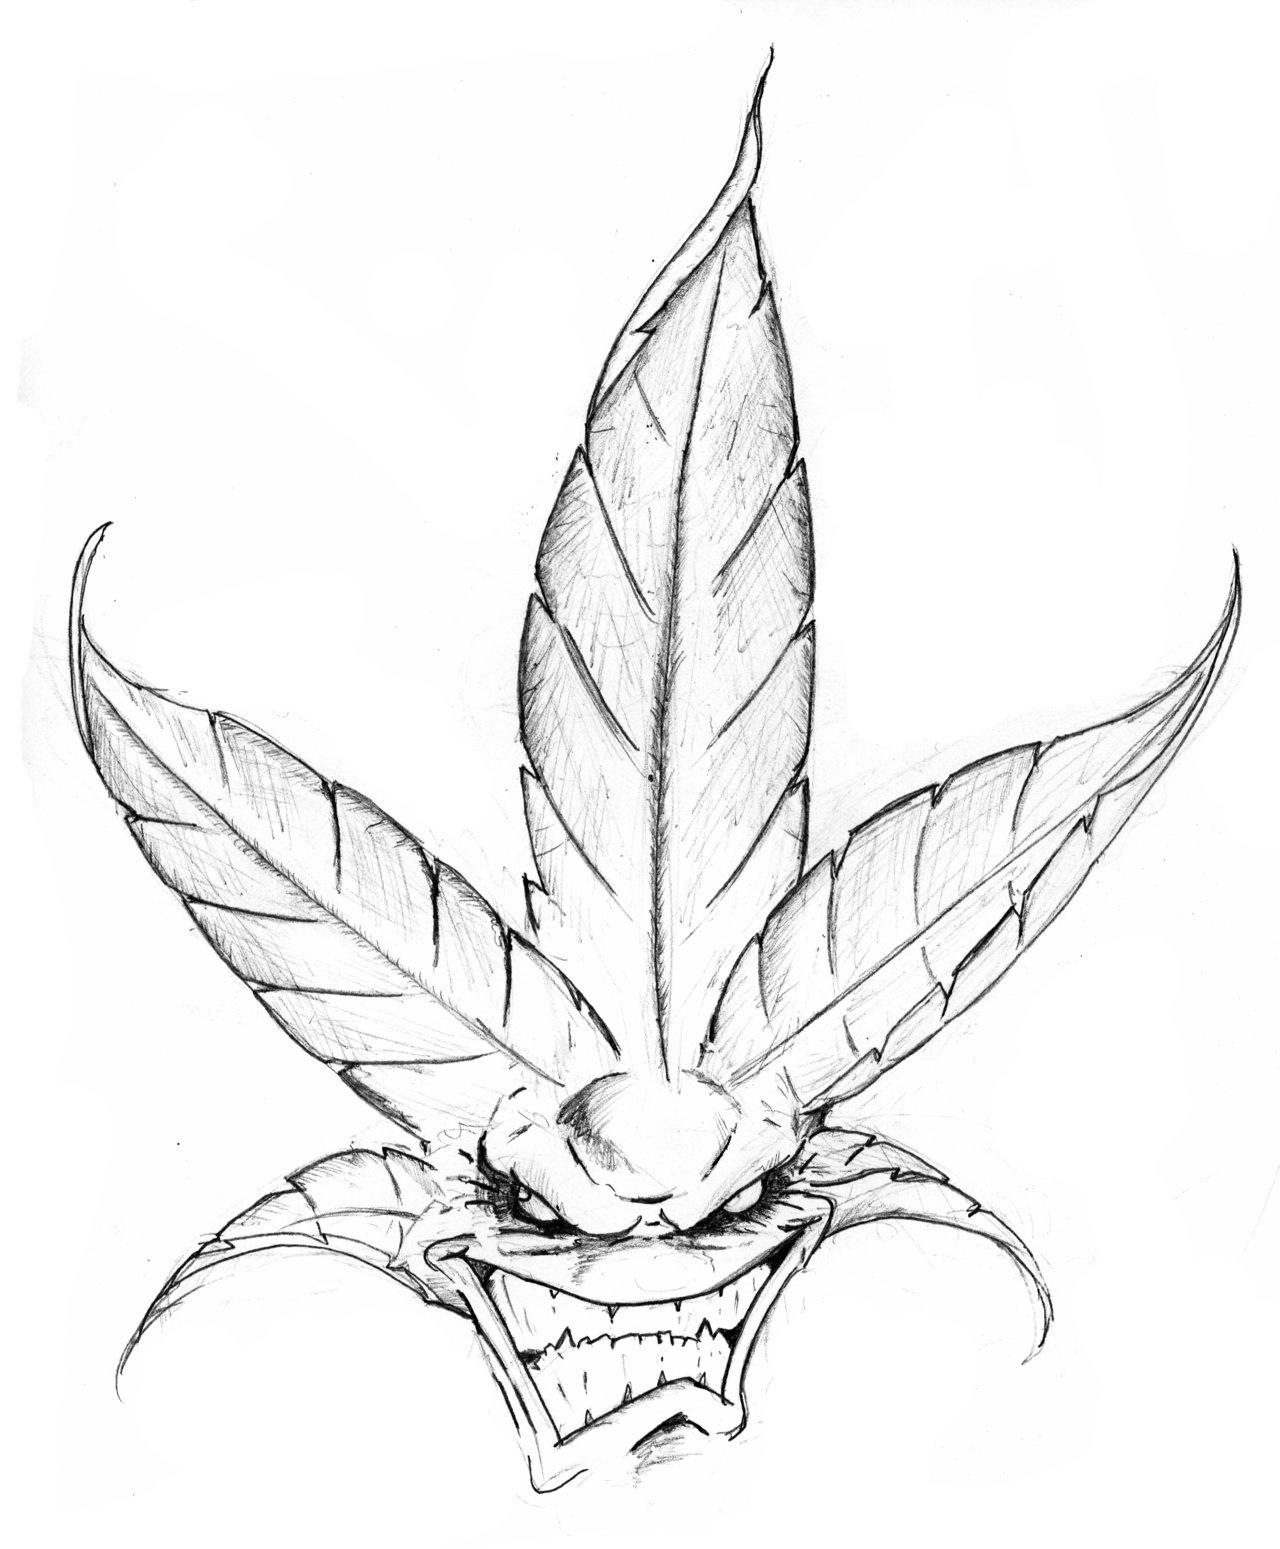 marijuana drawing at getdrawings com free for personal use